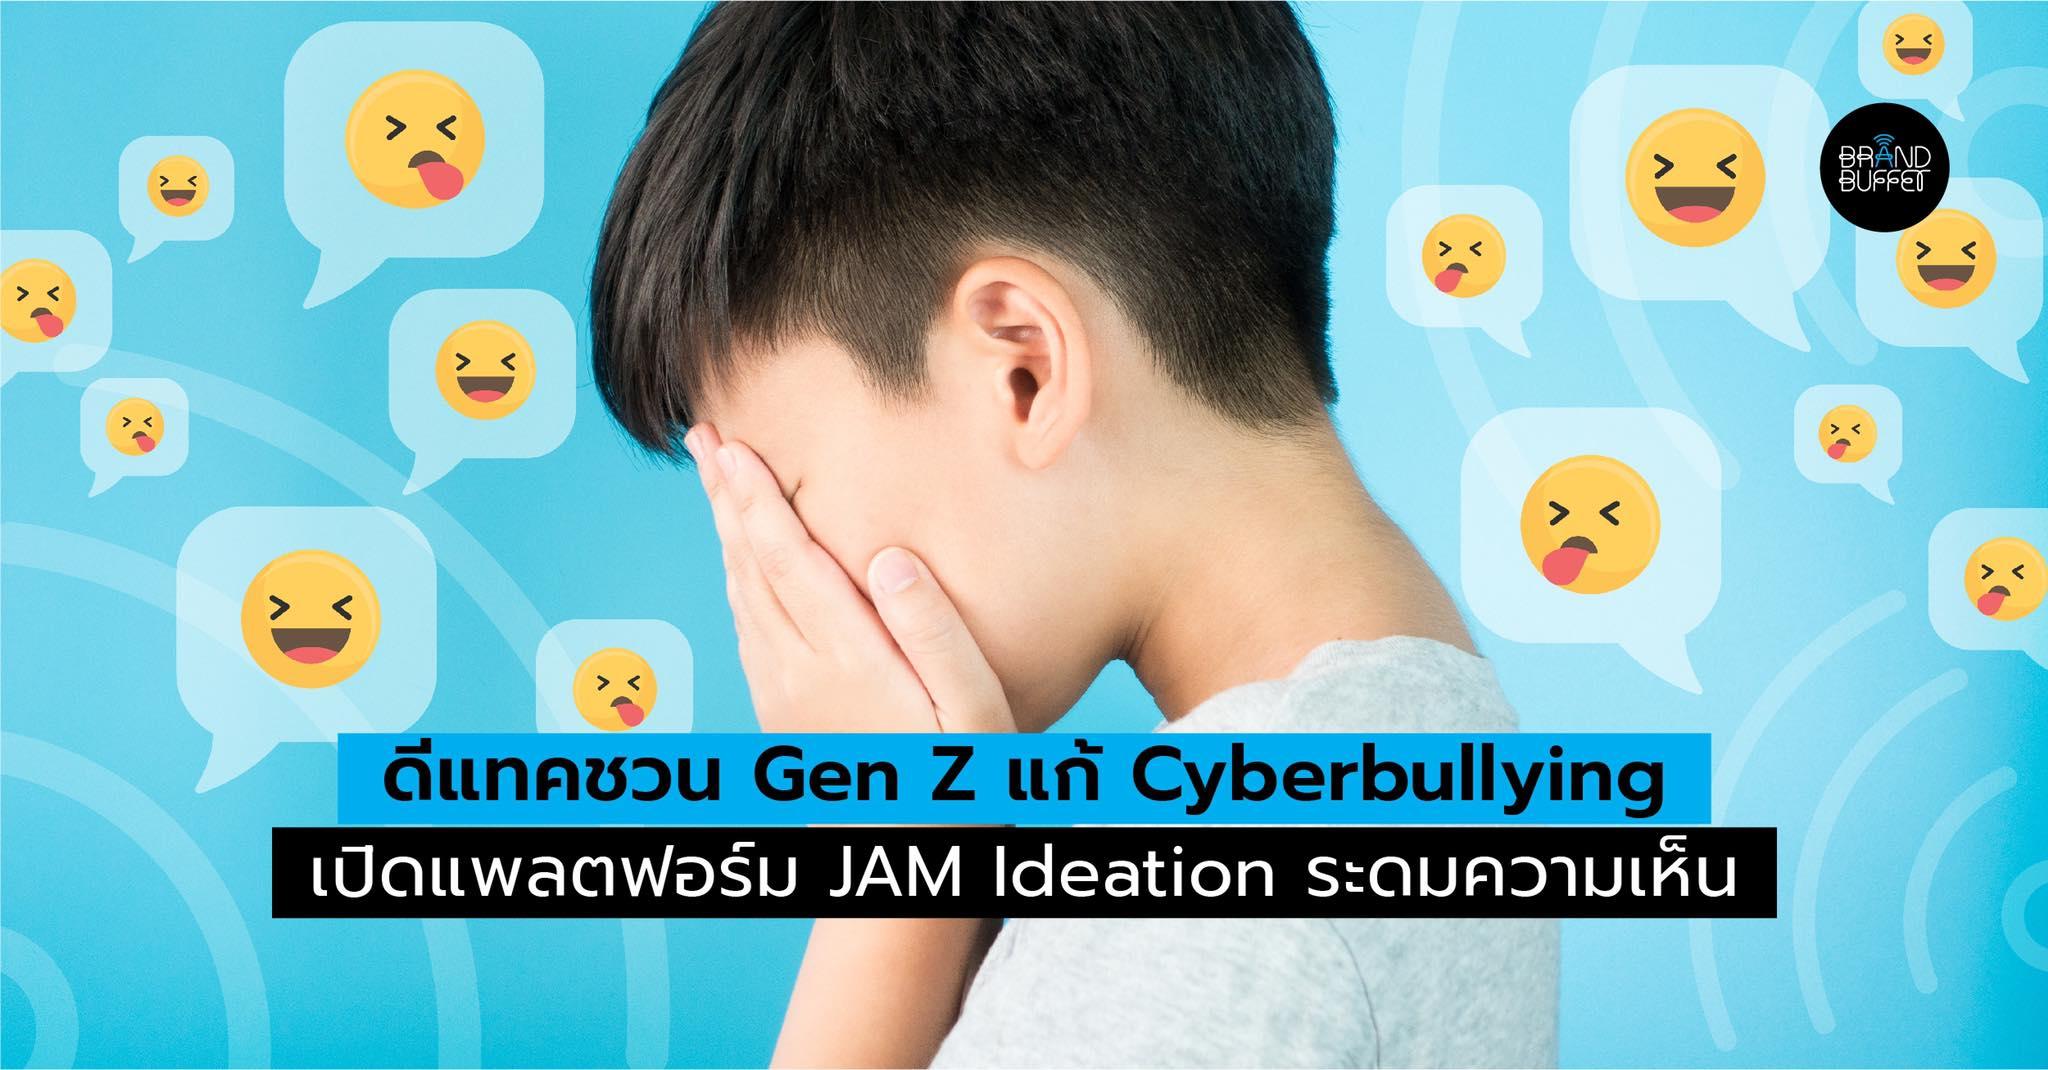 dtac cyberbullying